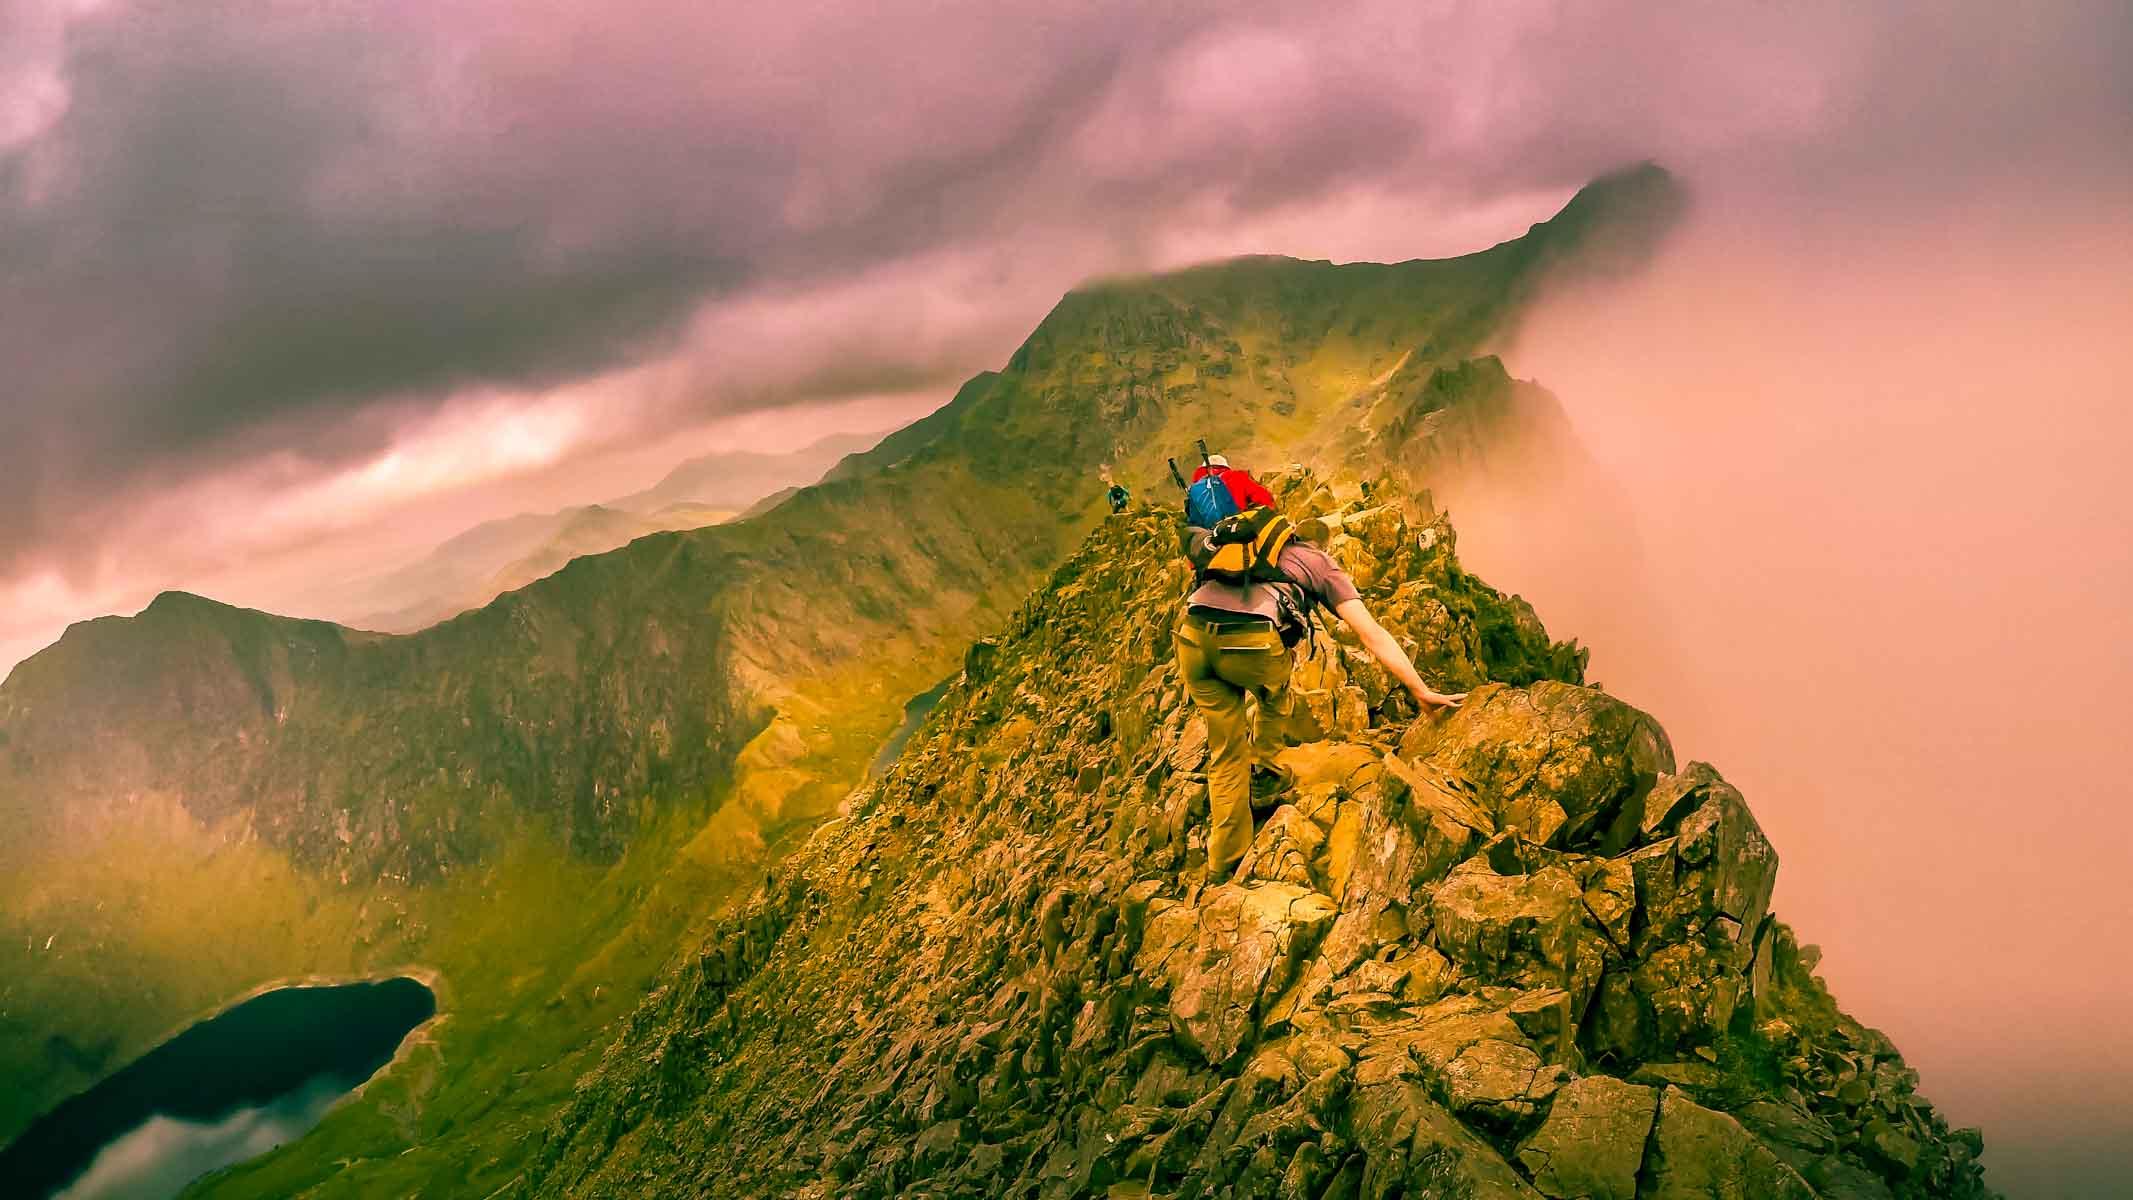 Crib Goch - One of Britain's Greatest Ridges